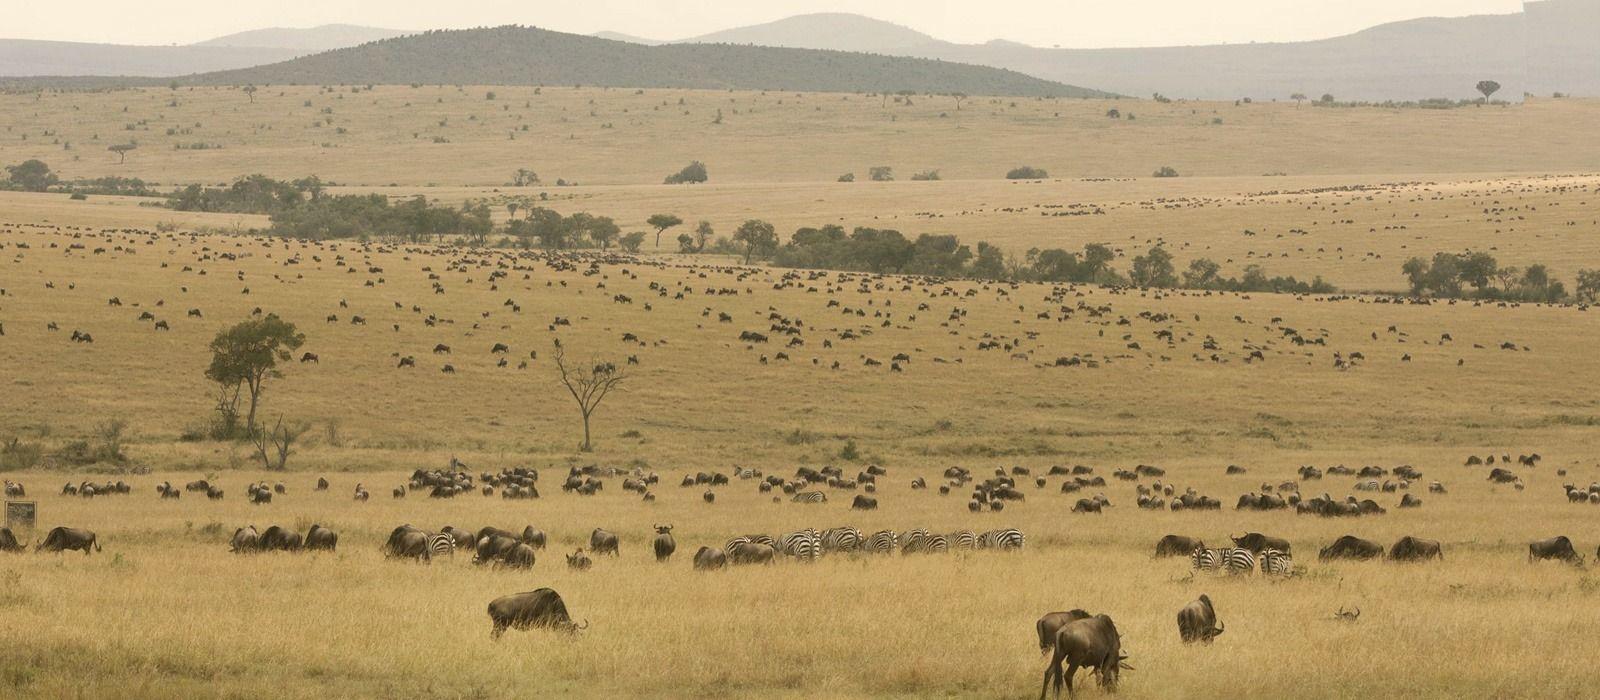 Kenia Reisen & Rundreisen 1